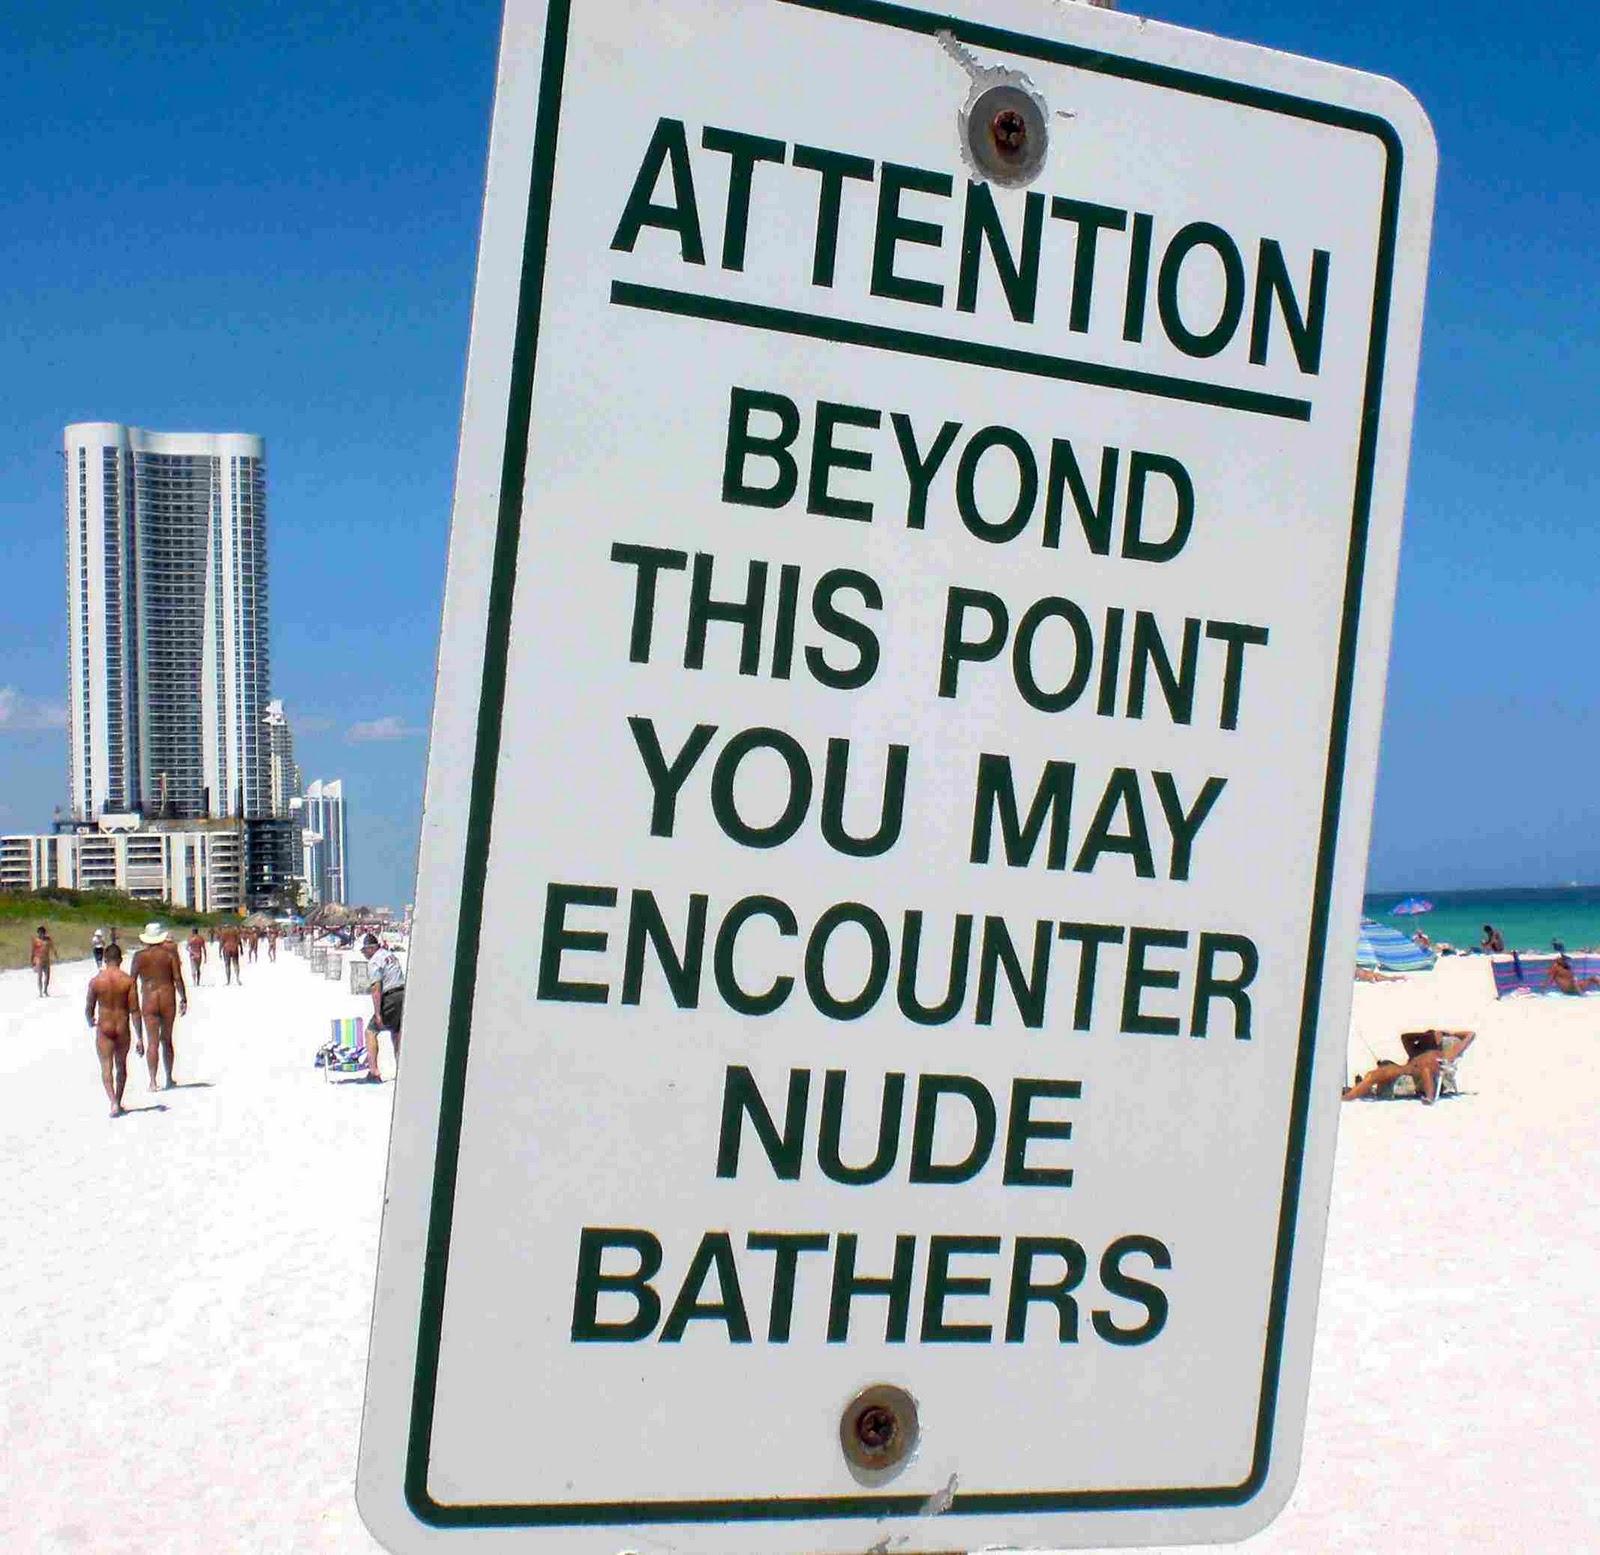 Nudist Zone